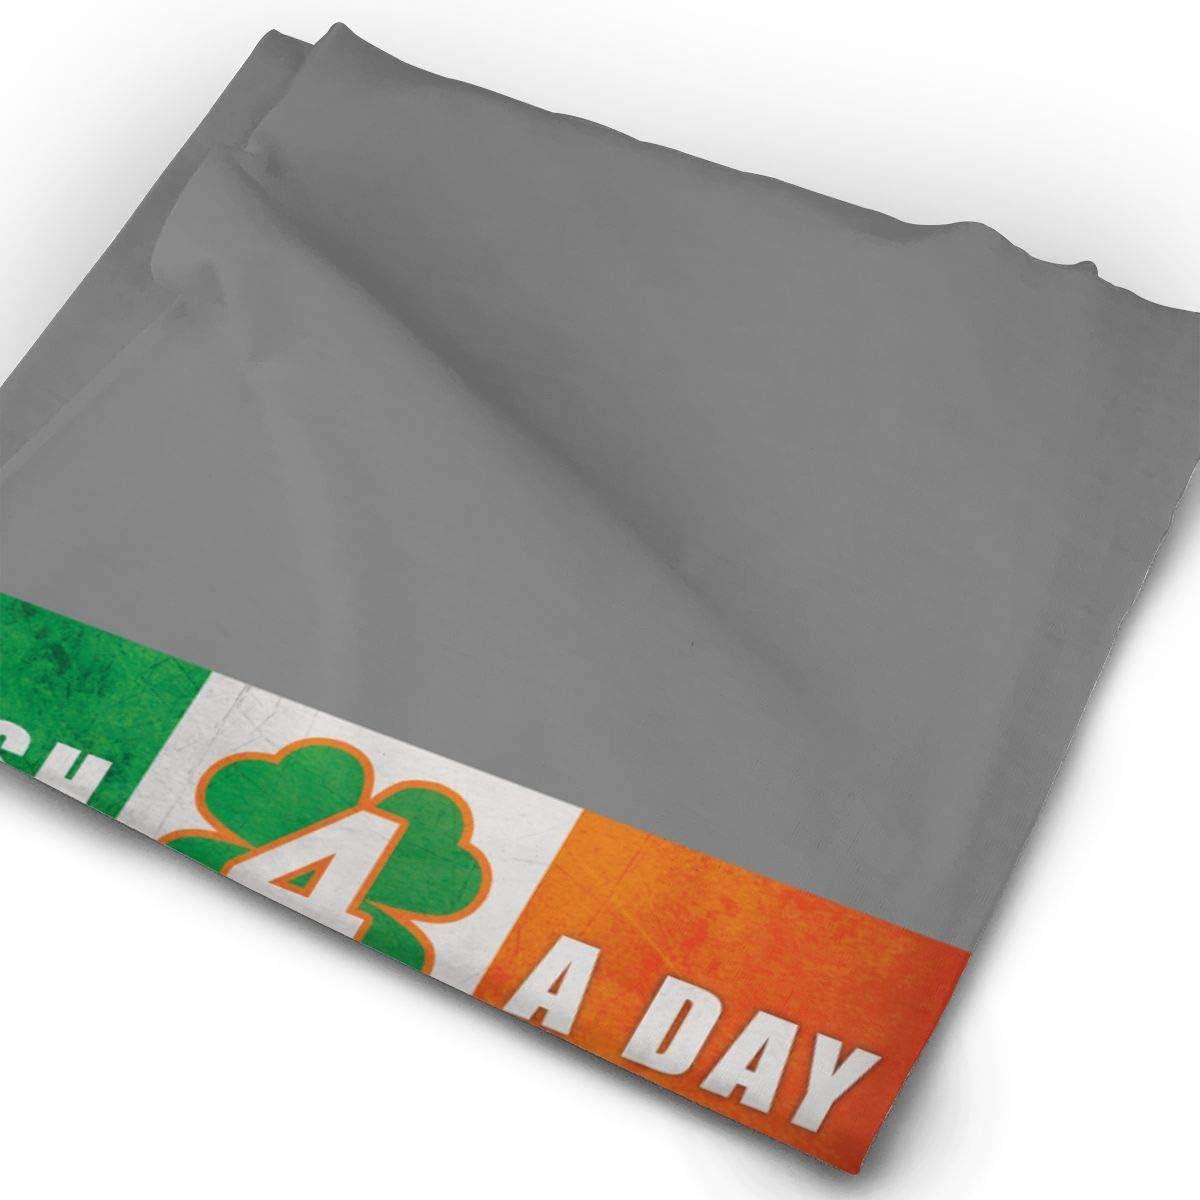 Neck Gaiter,Balaclava Headwear,Bandana Irish 4 A Day Multifunctional Headband Sports Magic Scarf